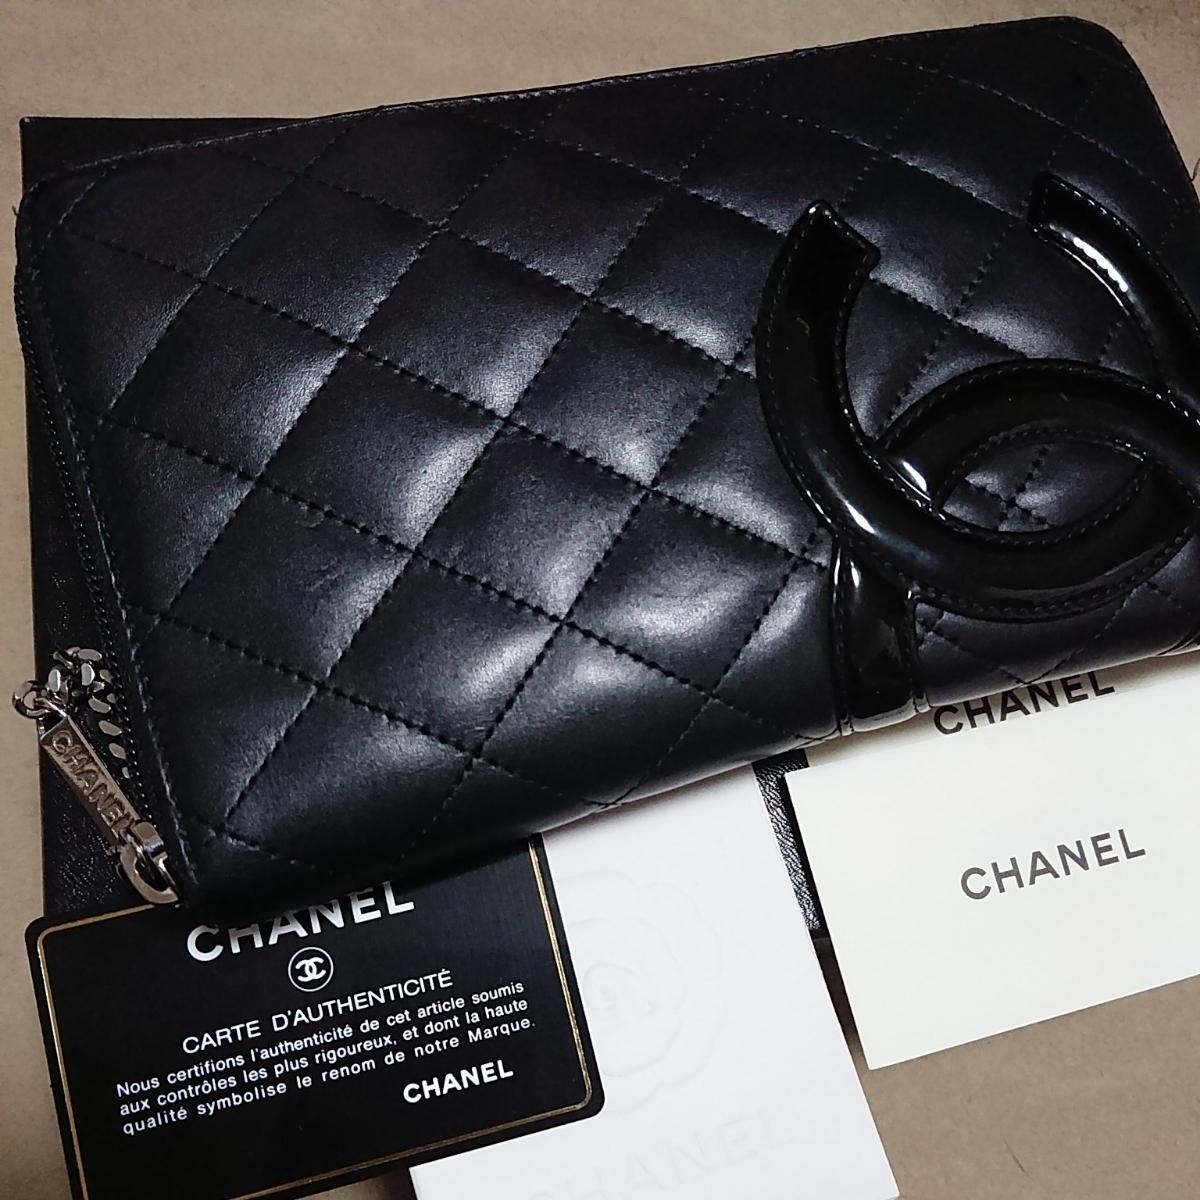 b98643c30b96 美品 シャネル CHANEL カンボンライン 長財布 ラウンドファスナー ブラック 黒の1番目の画像